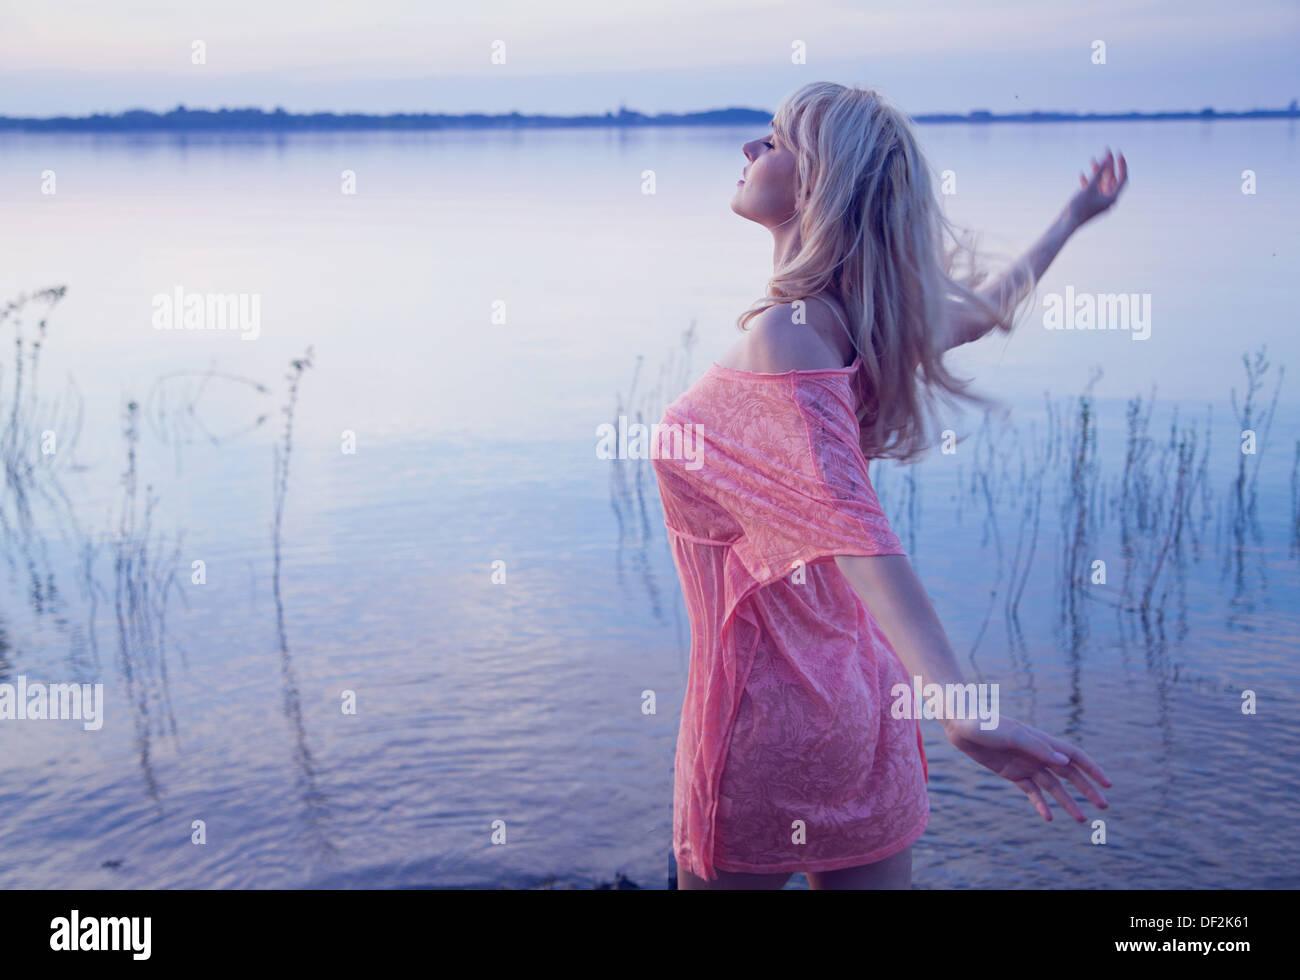 Art photo of blonde female model walking in the wather - Stock Image